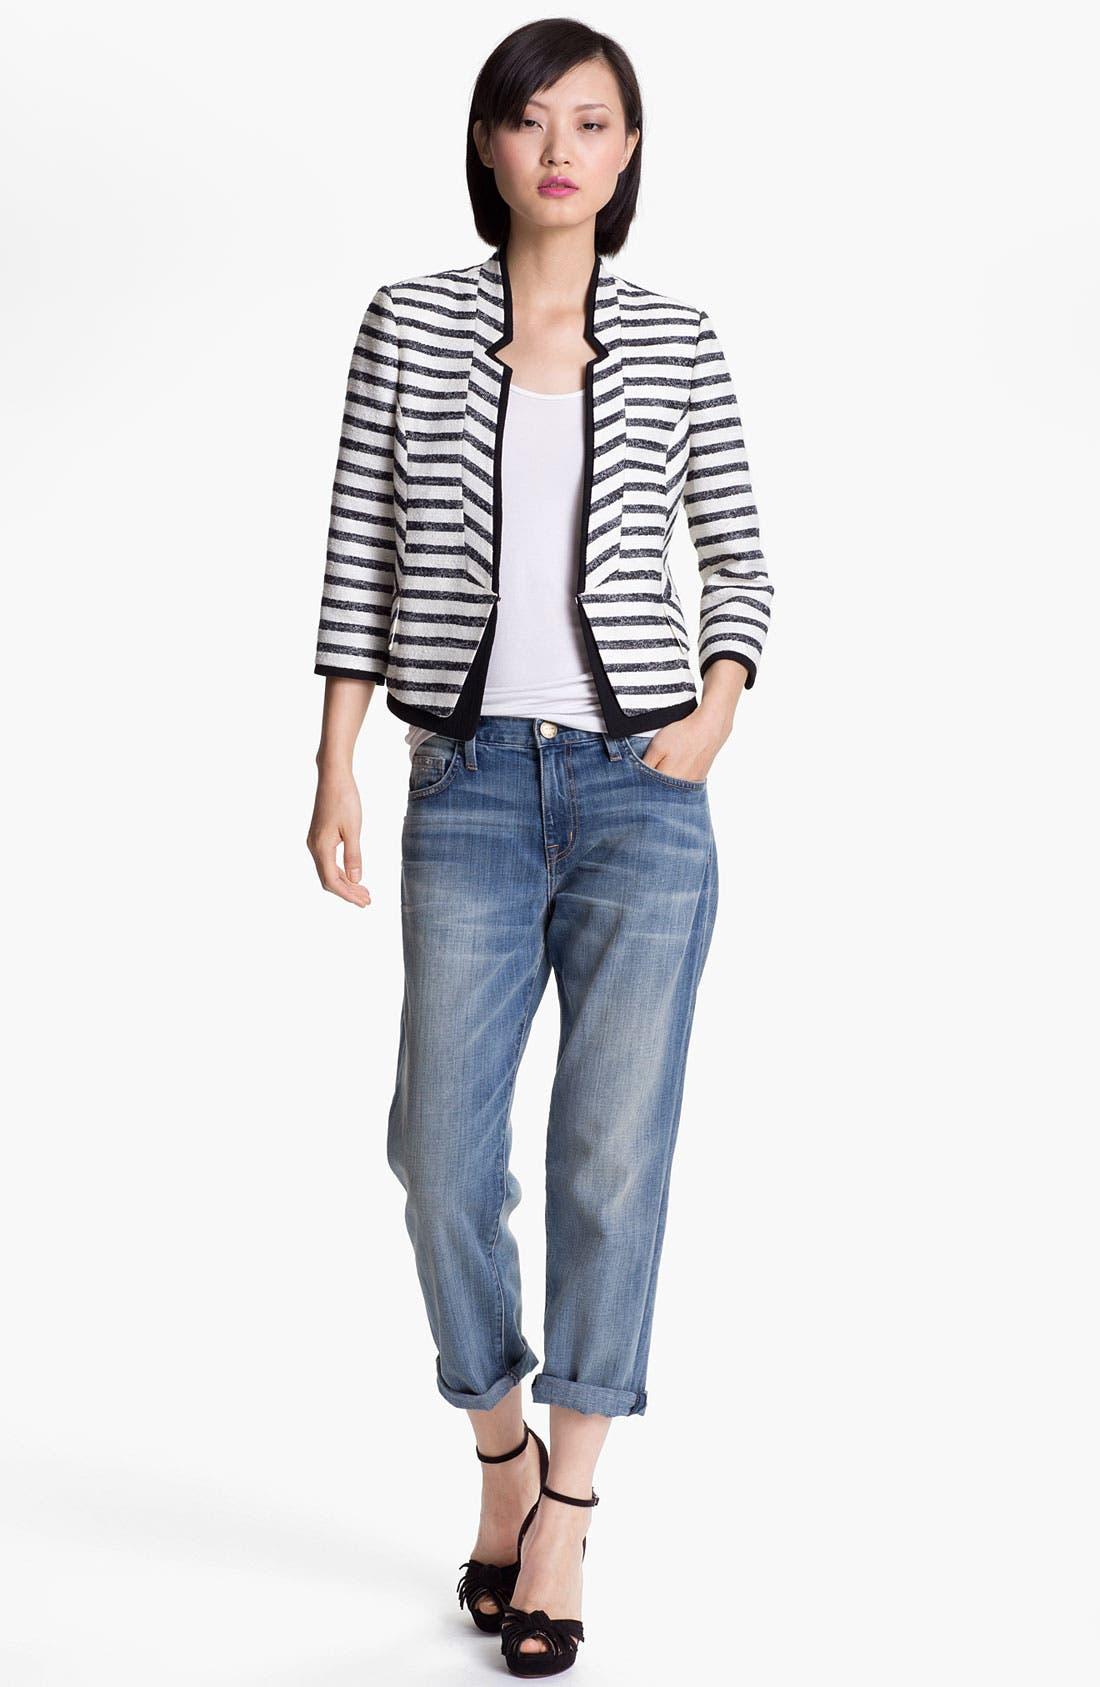 Alternate Image 1 Selected - Mcginn 'Evan' Stripe Blazer